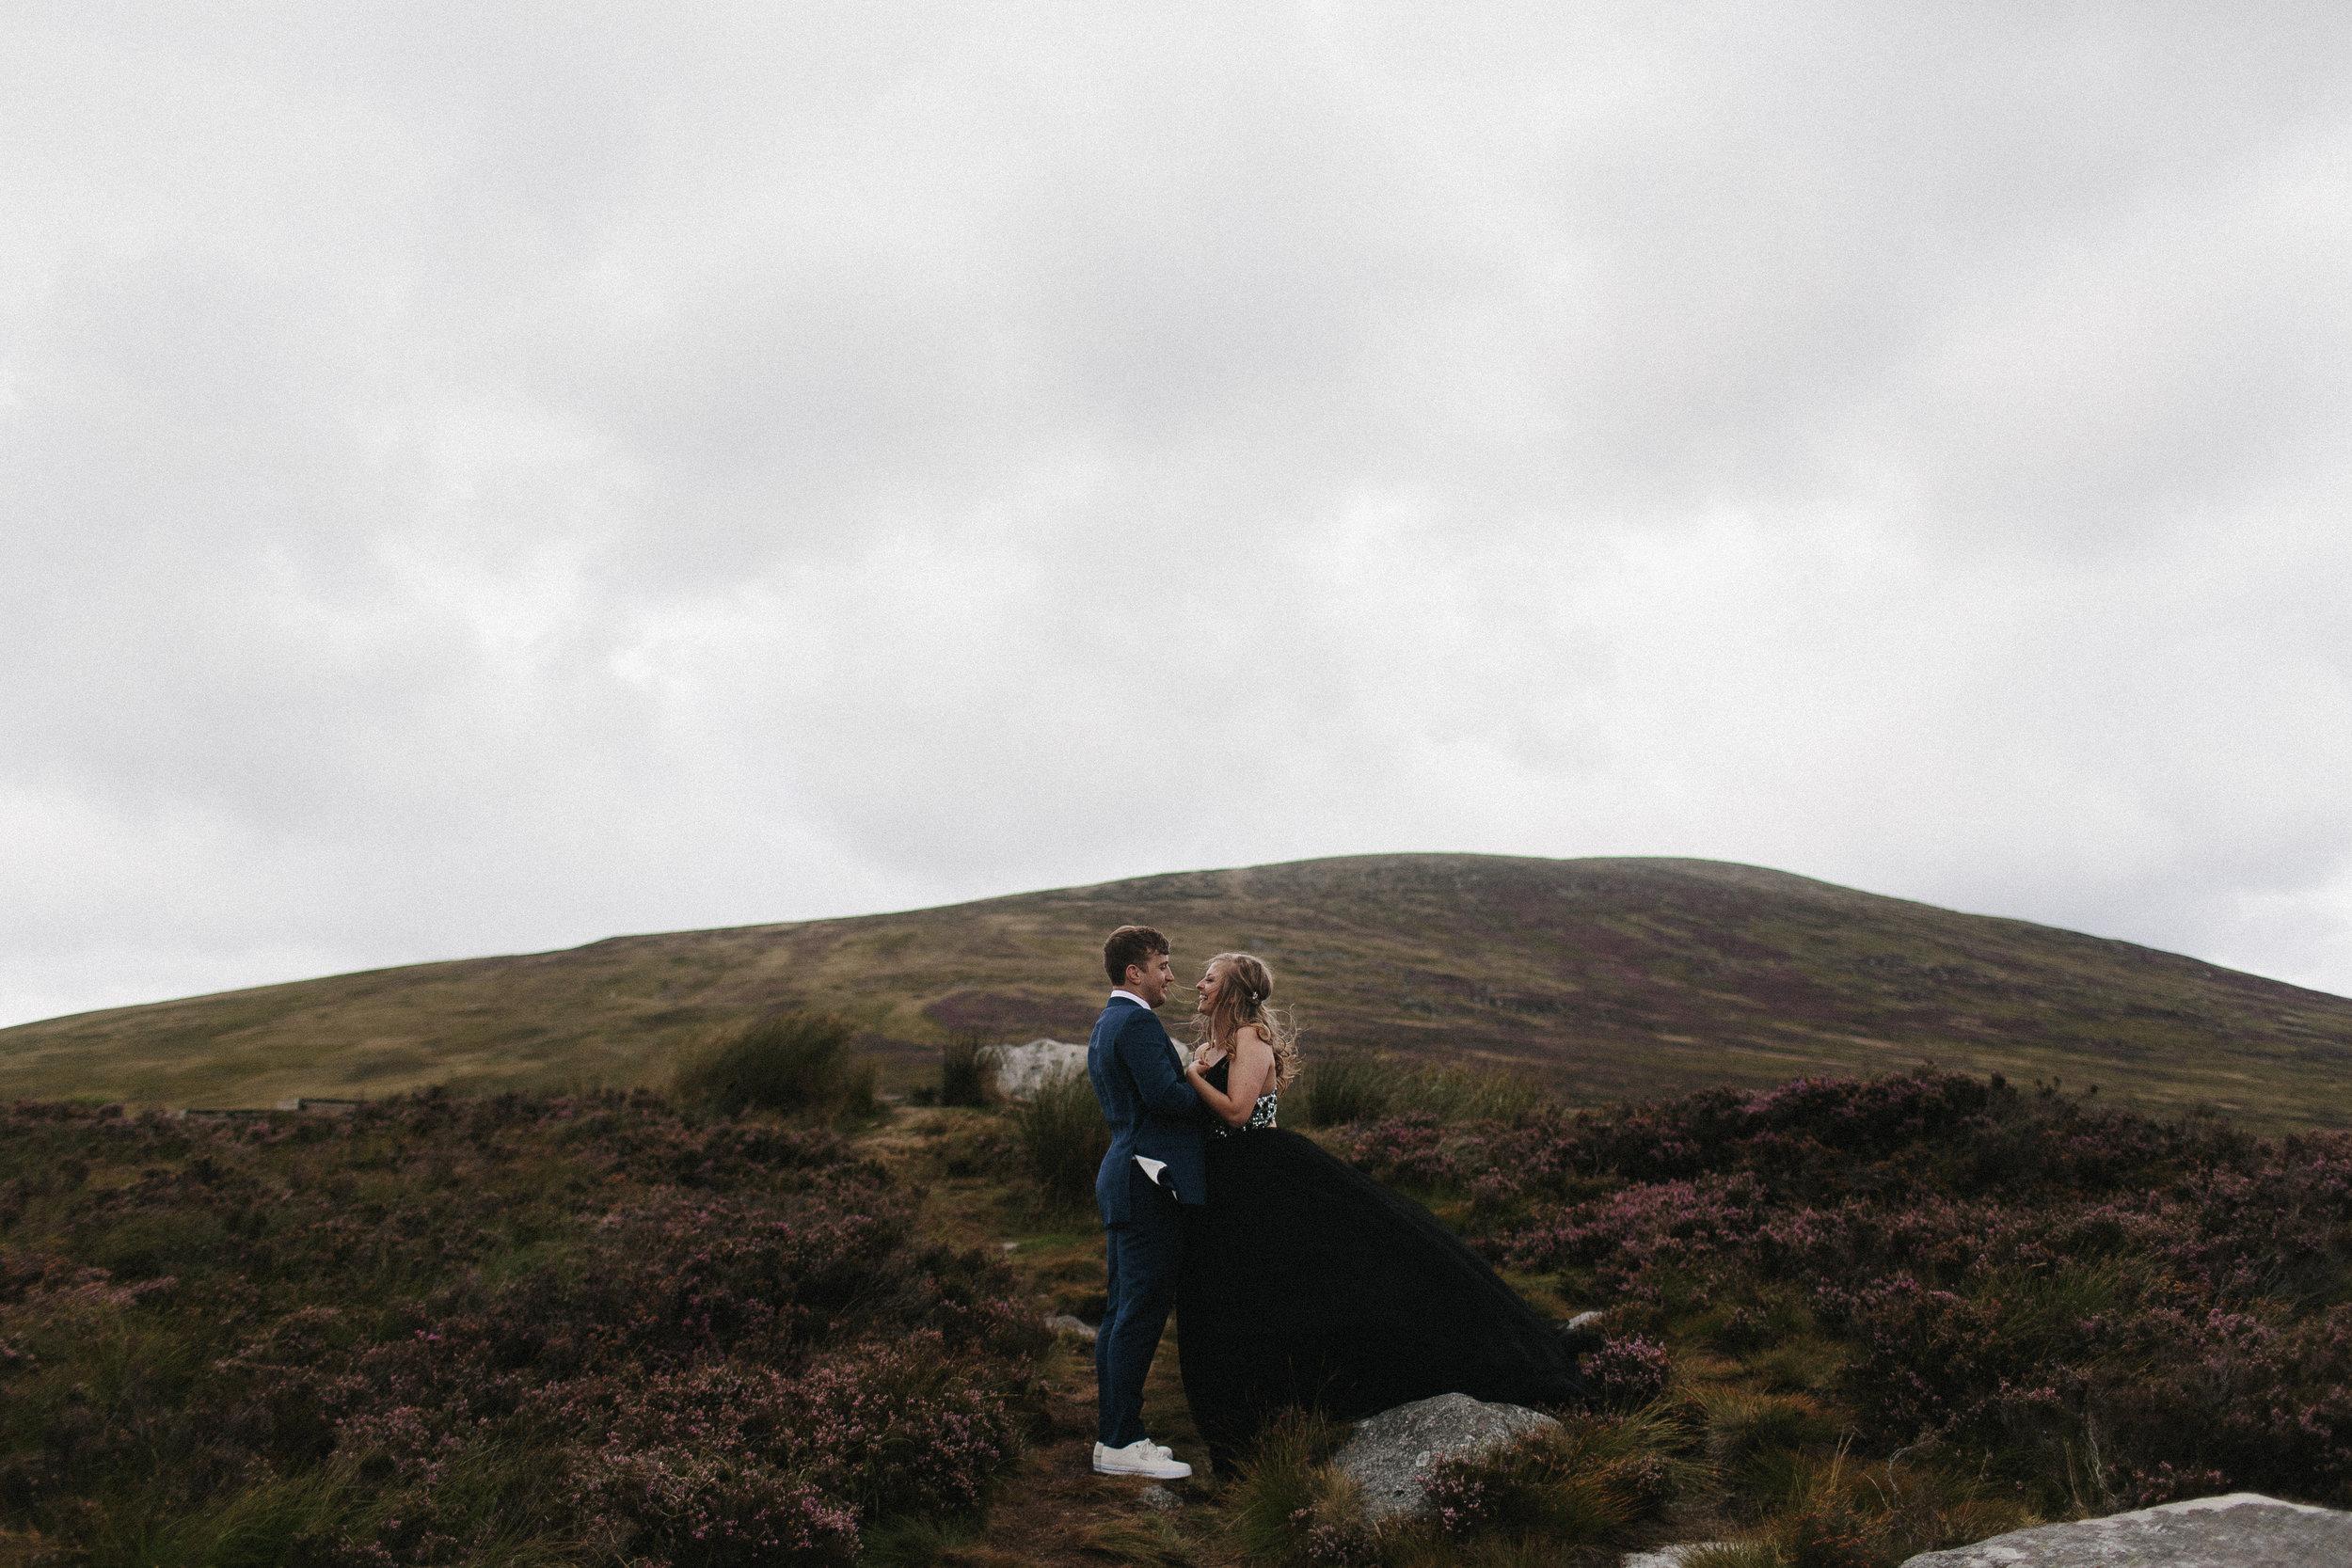 ireland_elopement_black_wedding_dress_wicklow_glendalough_athy_st_kevins_way_1634.jpg